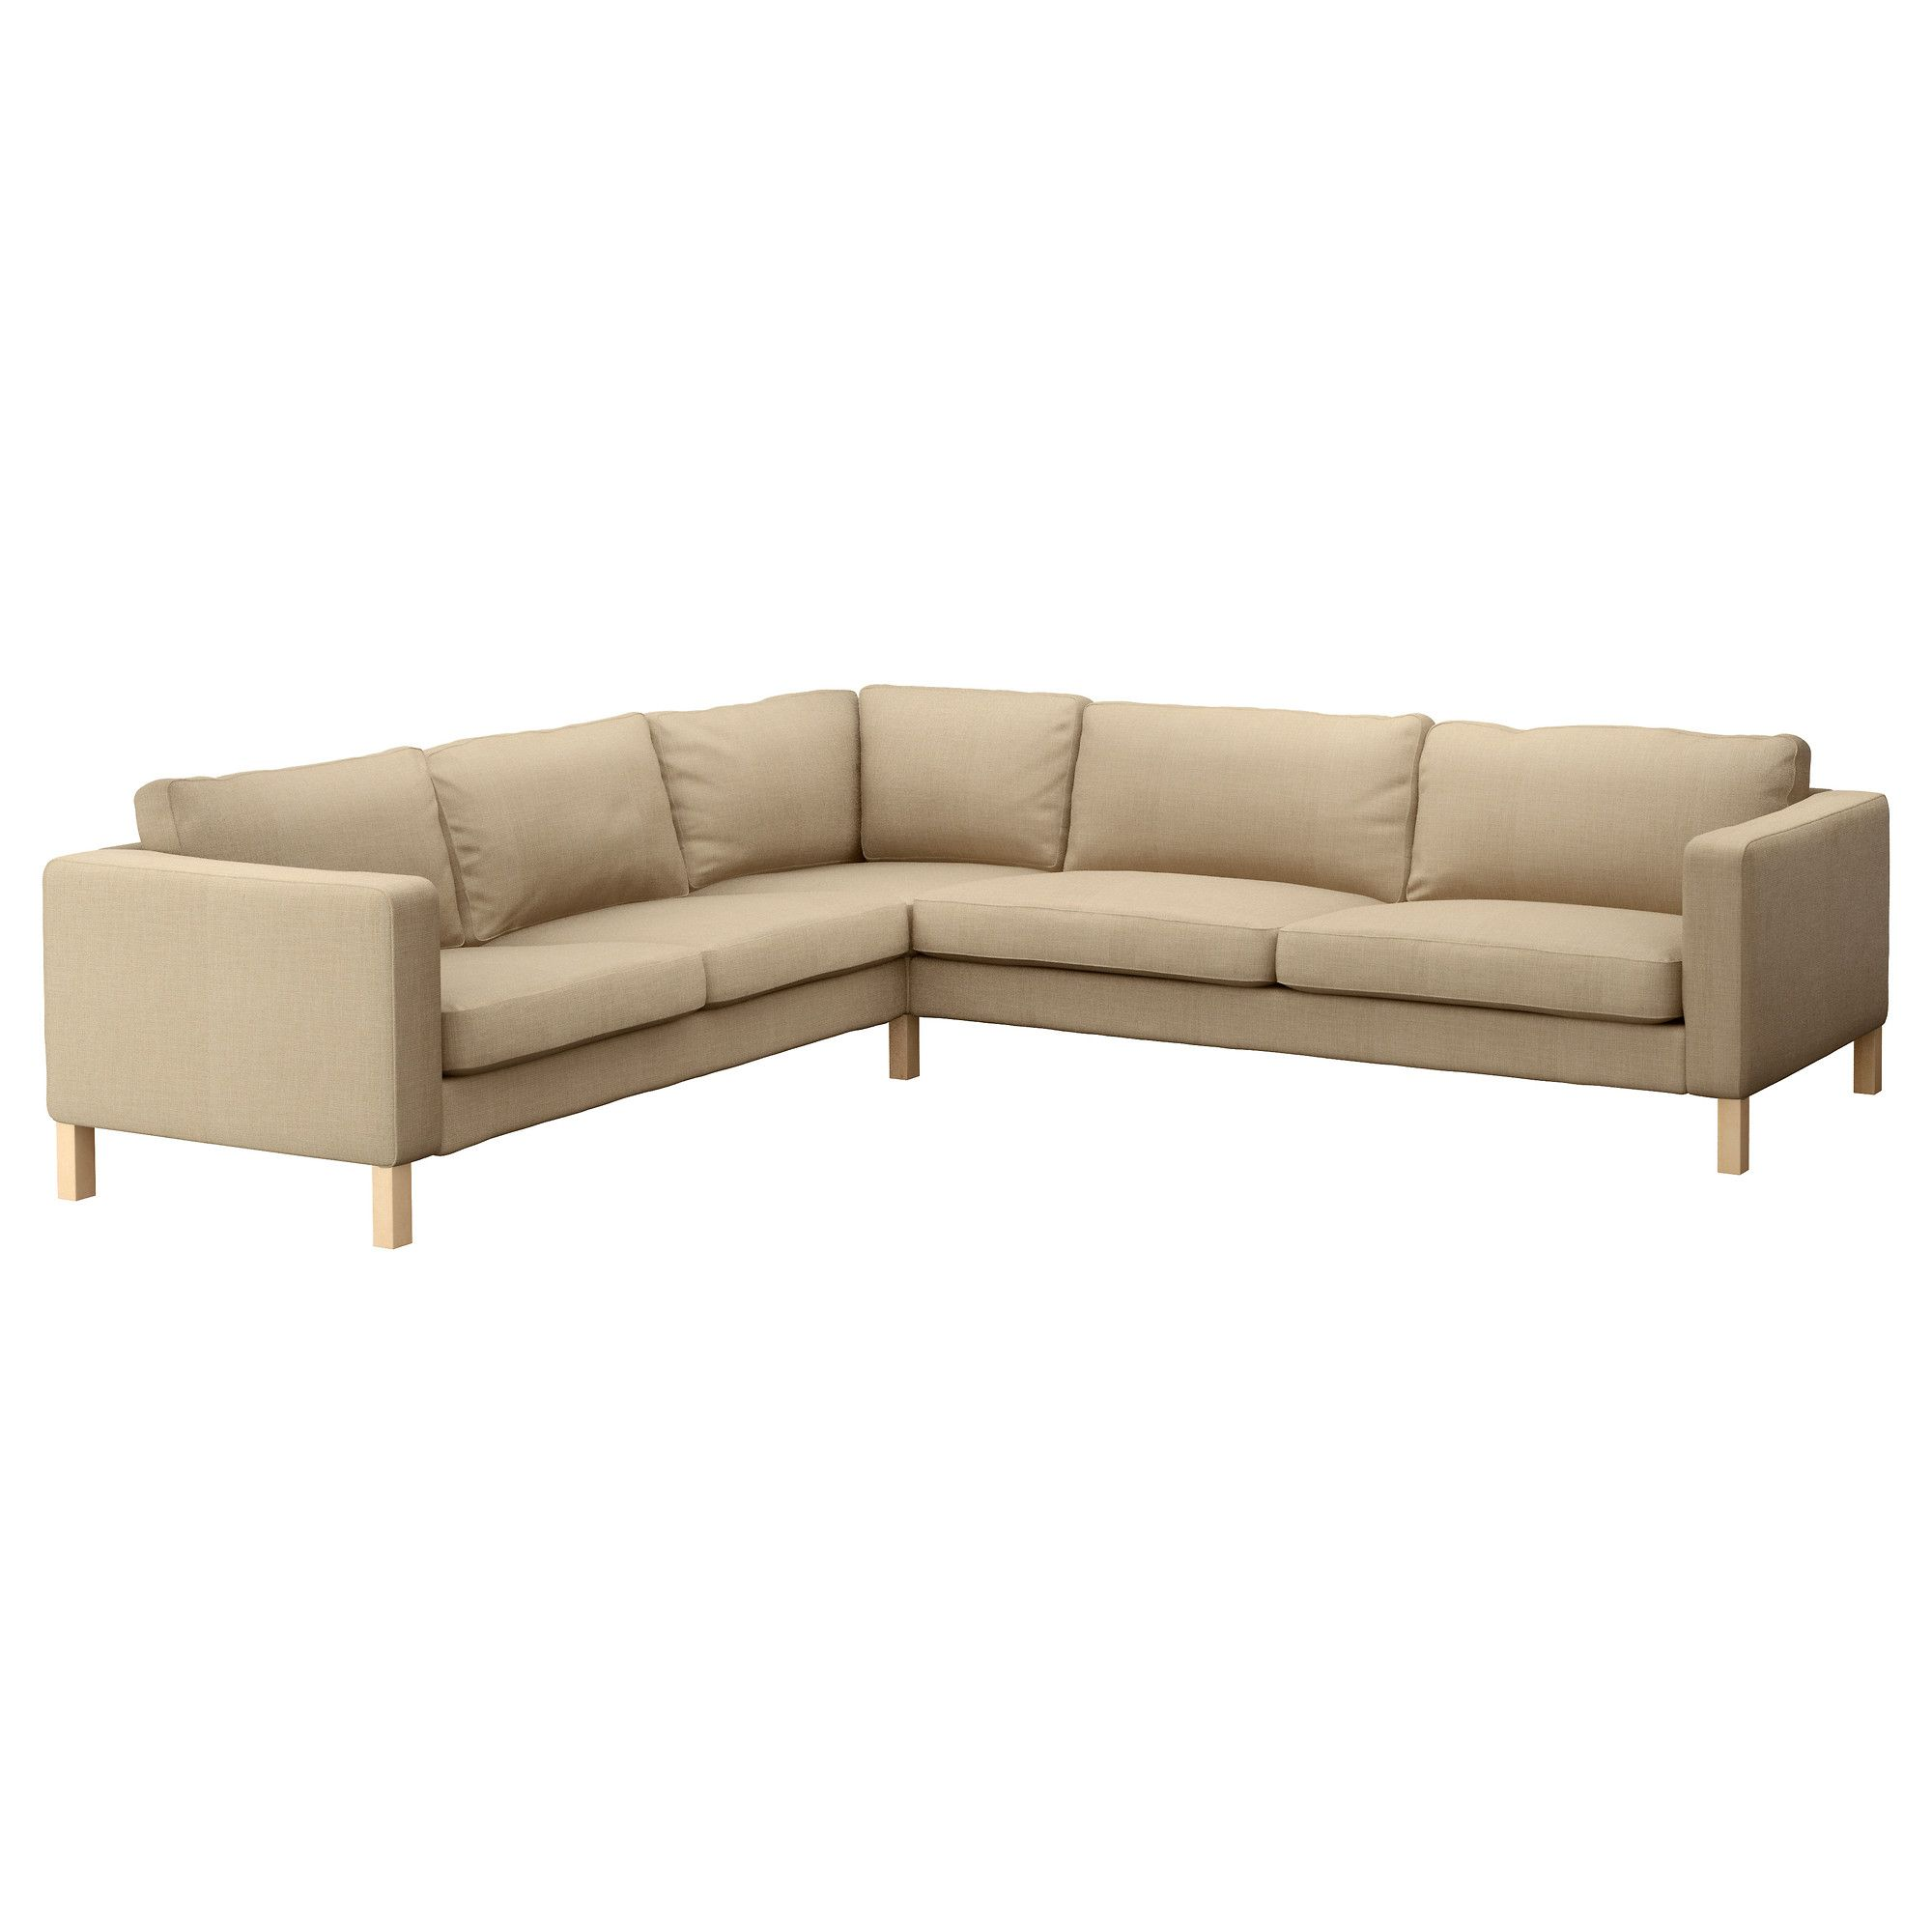 KARLSTAD Corner sofa 2 3 3 2 Lindö beige IKEA